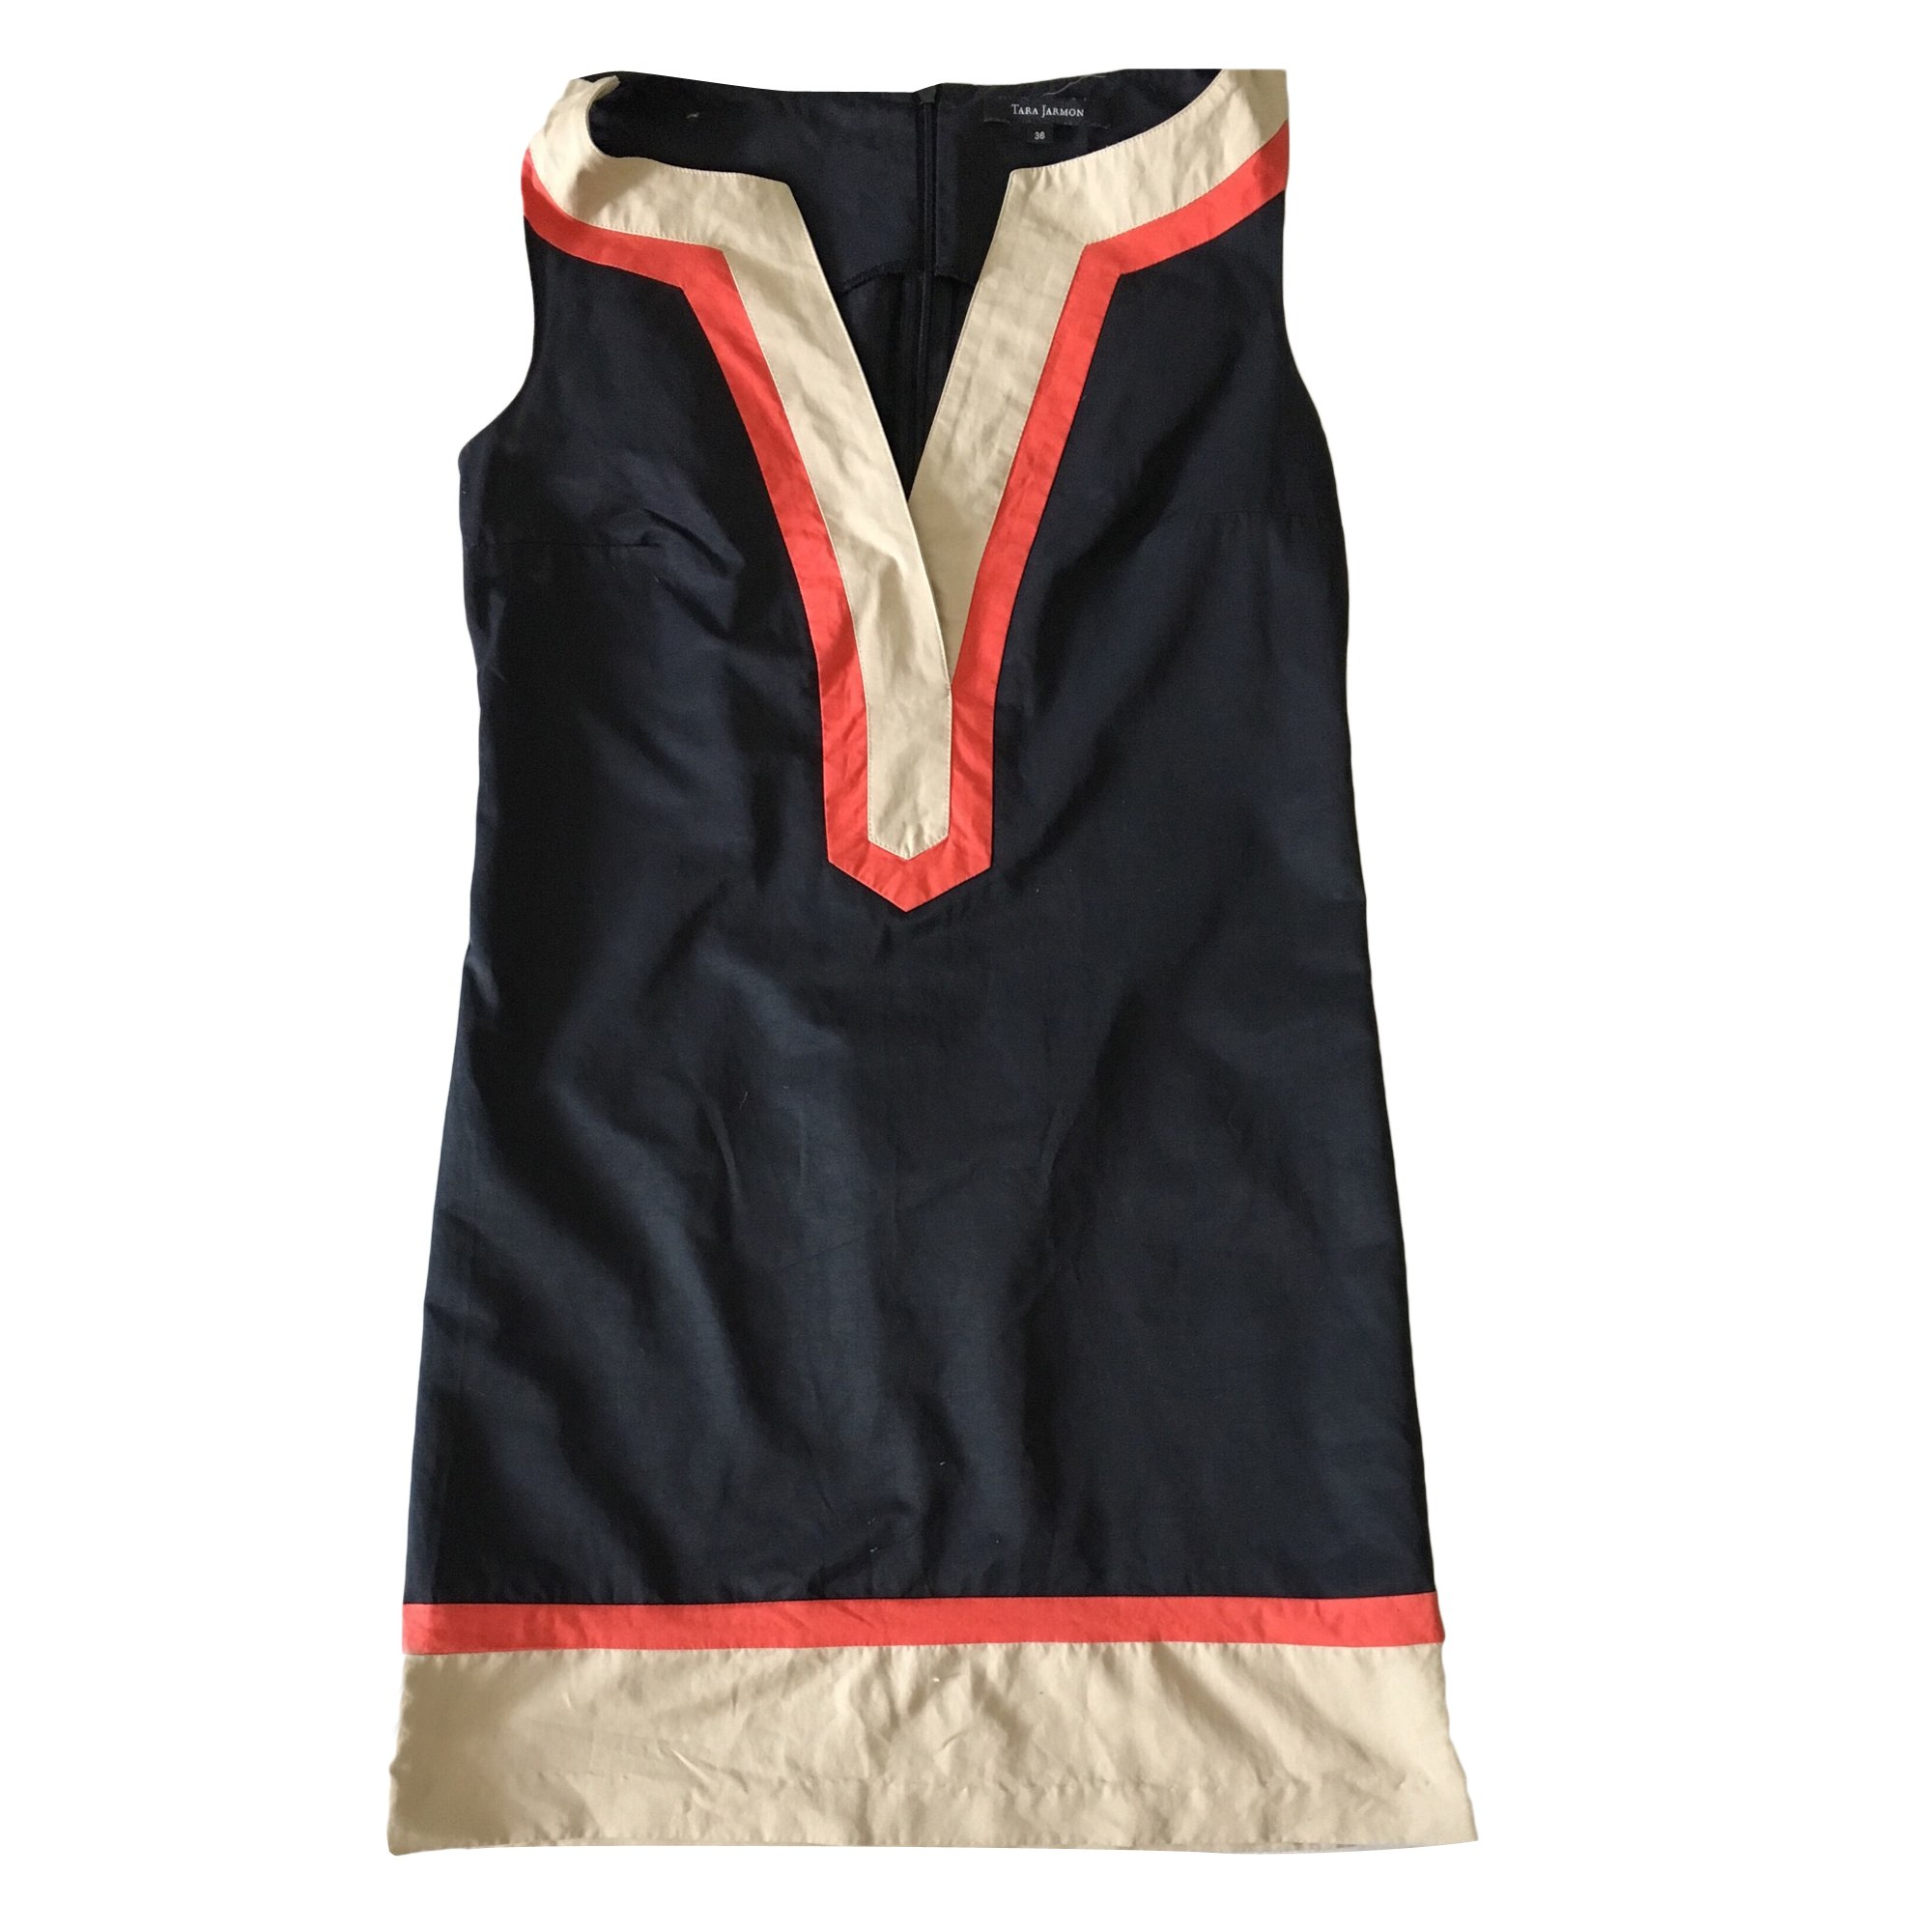 Robe mi-longue TARA JARMON Multicouleur